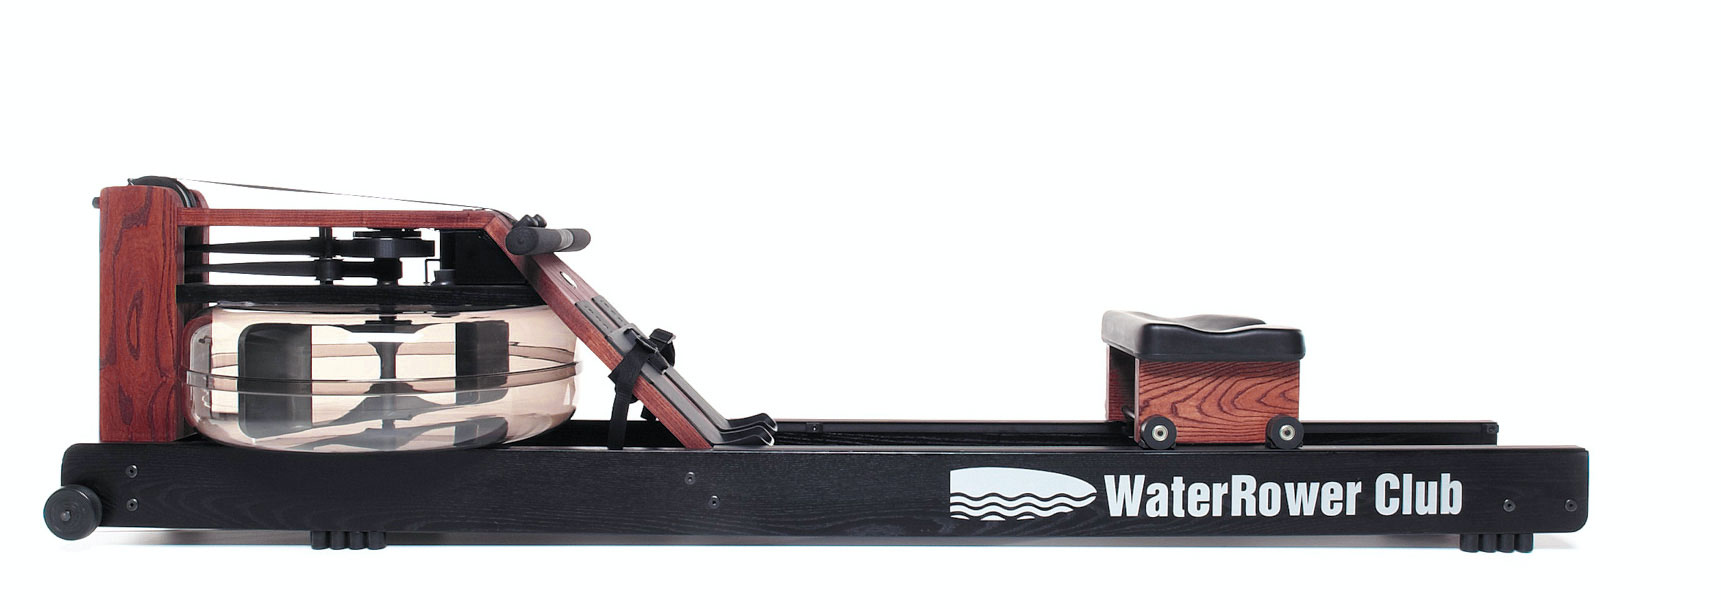 WaterRower Club-Sport